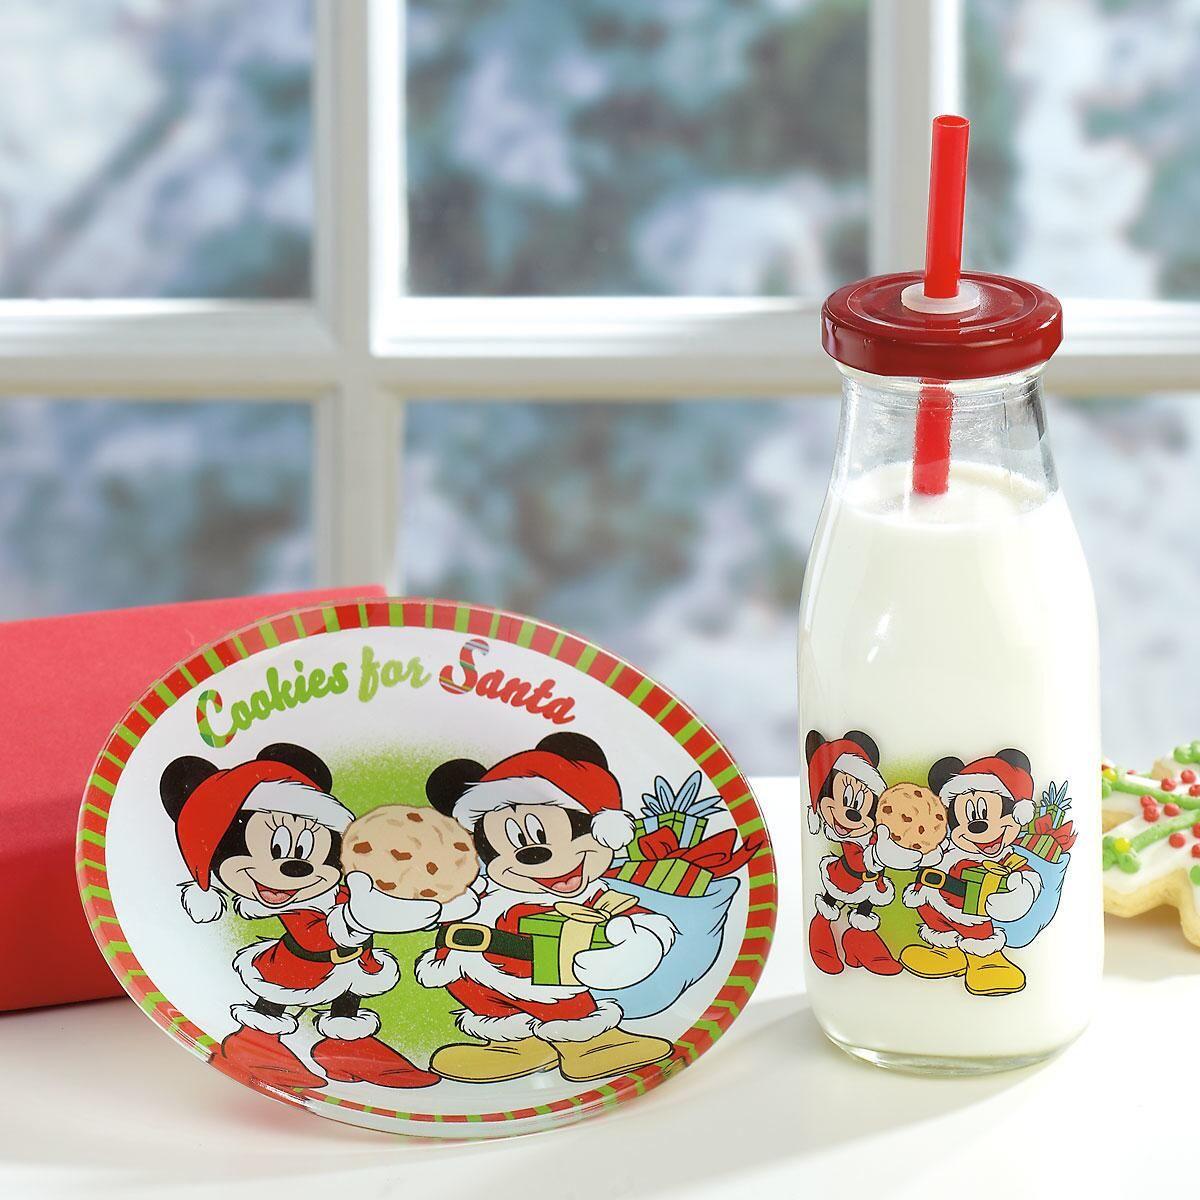 Mickey & Minnie Cookies for Santa